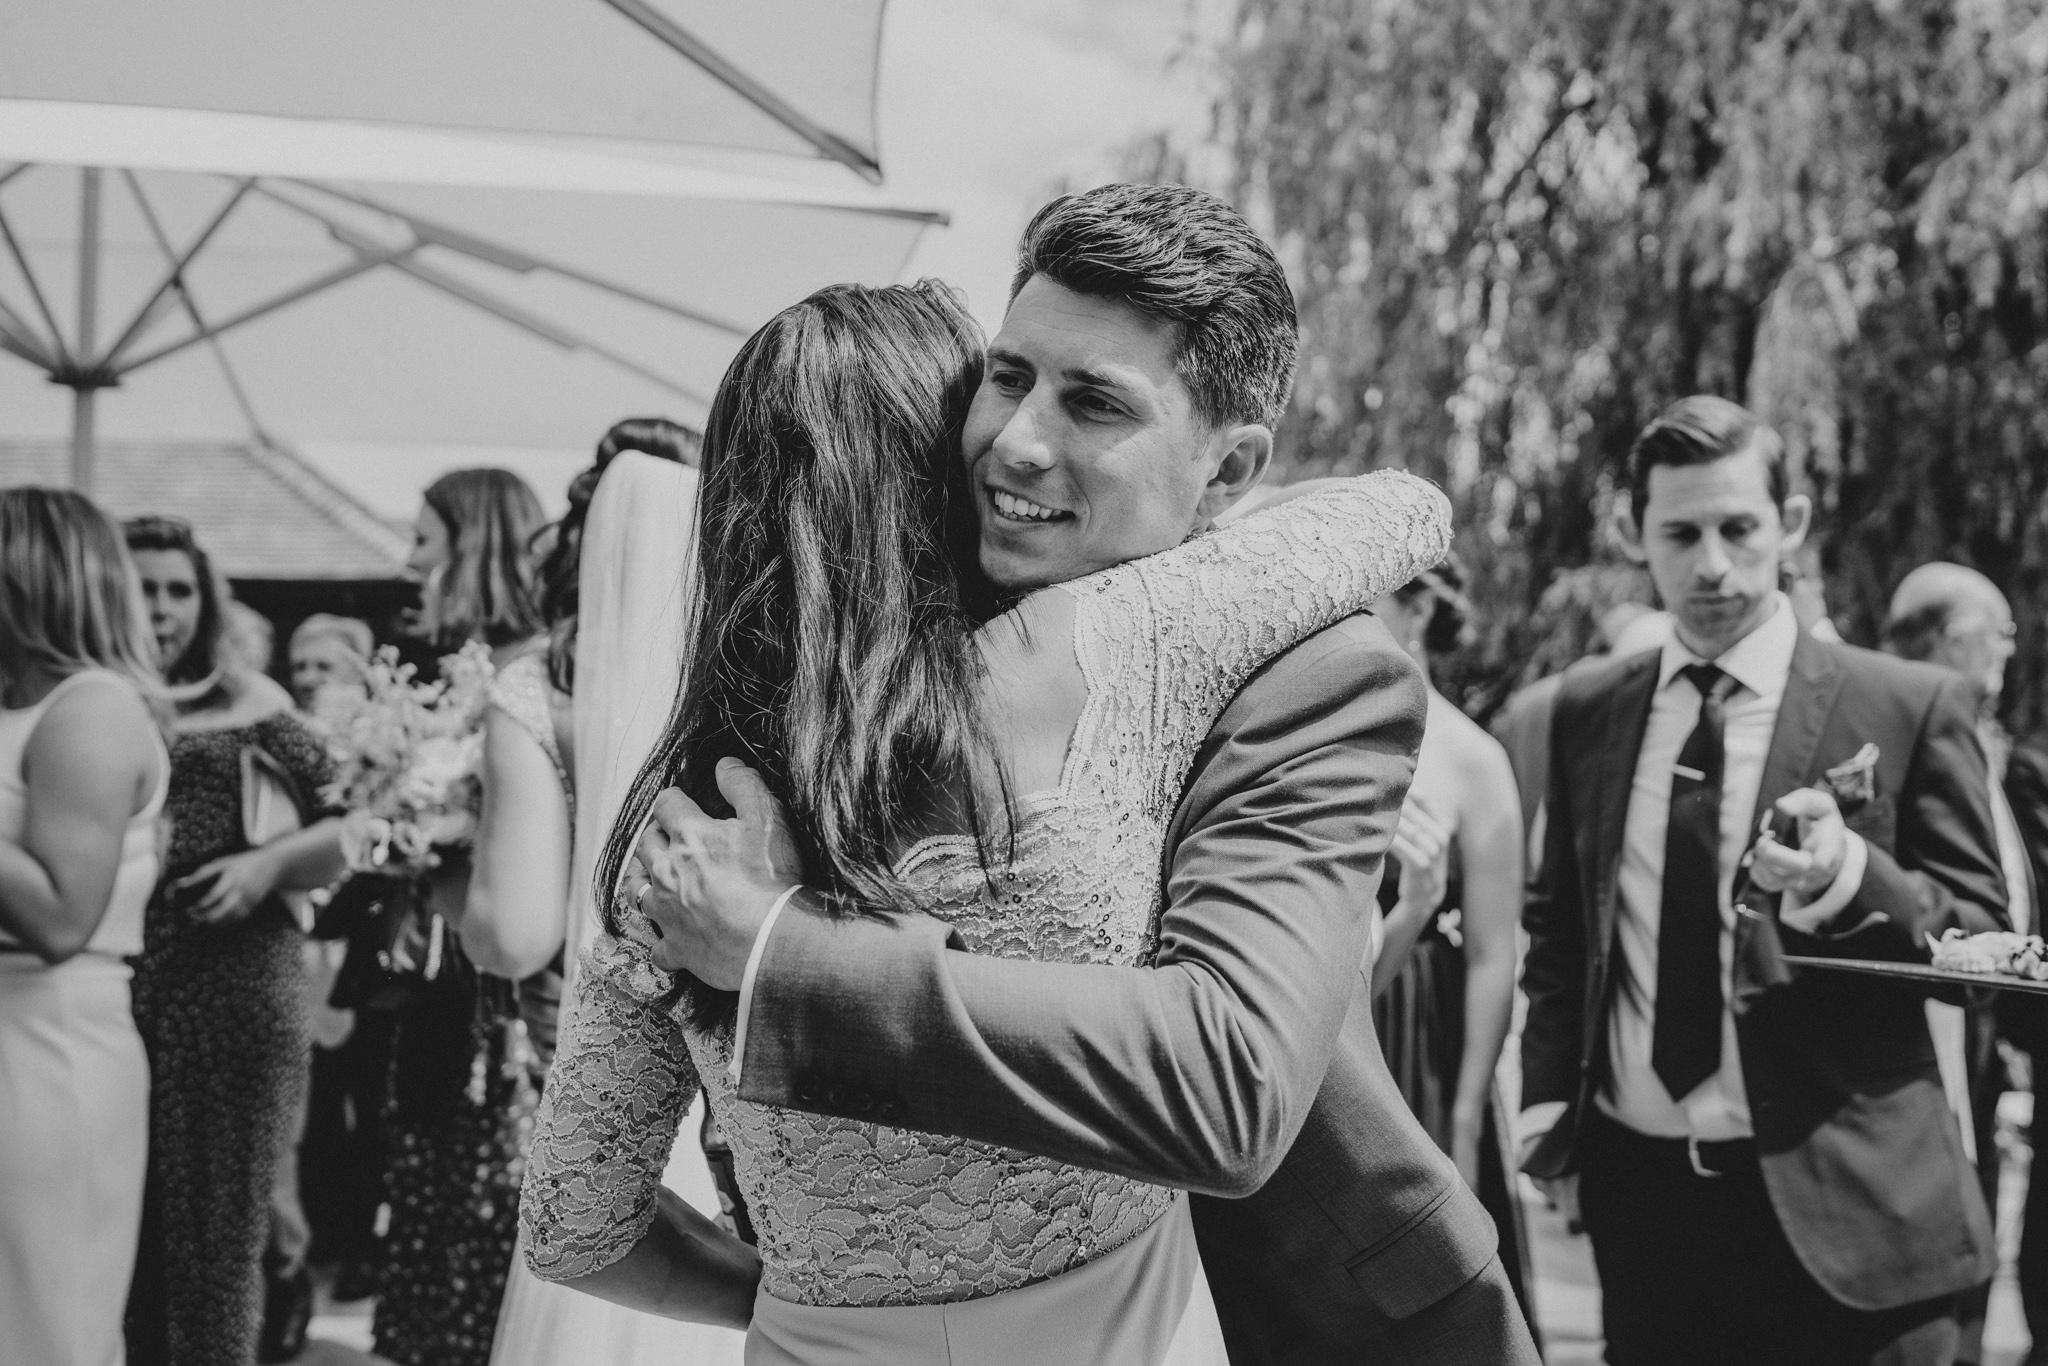 danielle-and-gareths-boho-wedding-previews-at-high-house-weddings-grace-elizabeth-colchester-essex-suffolk-norfolk-devon-alternative-wedding-and-lifestyle-photographer (34 of 76).jpg